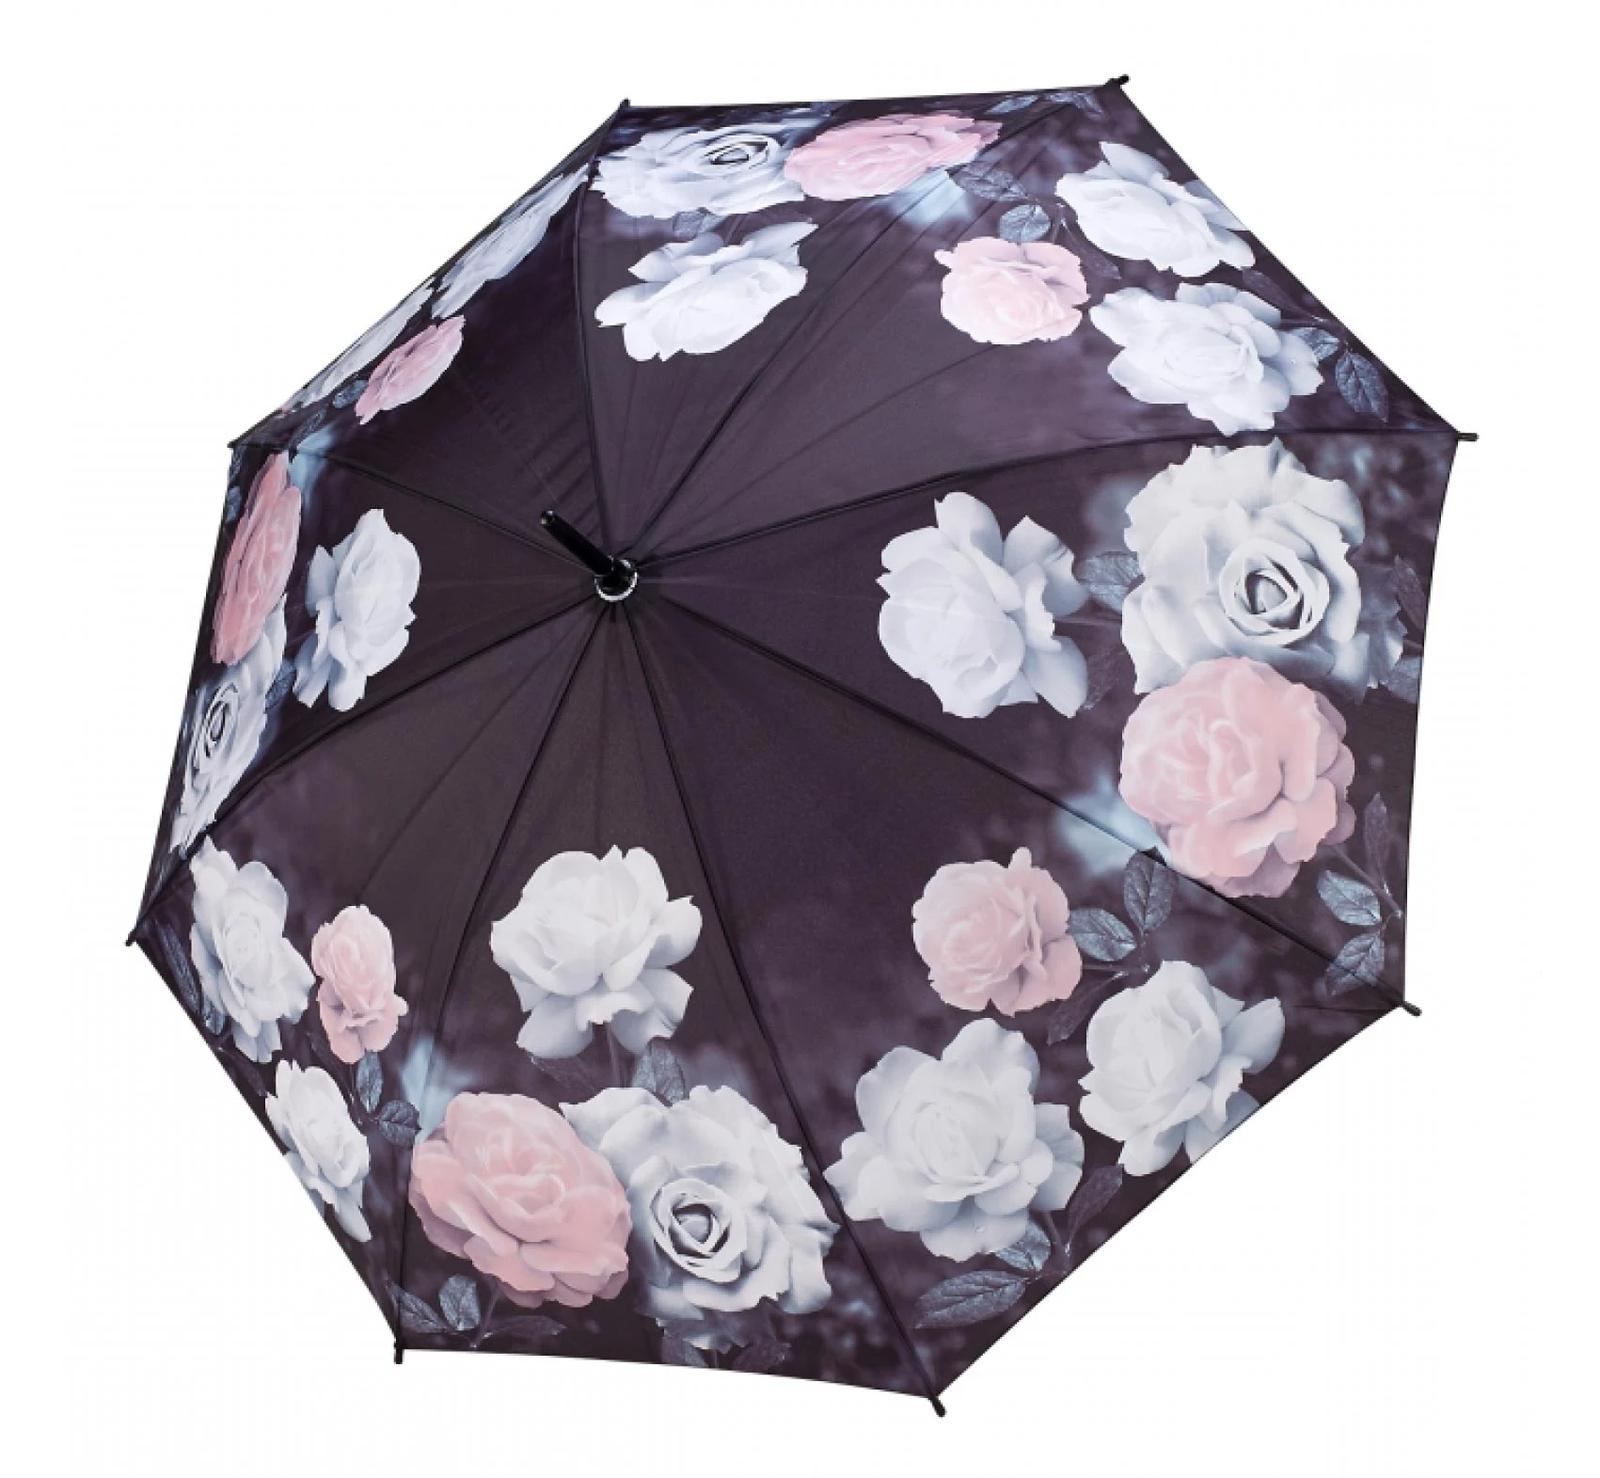 Clifton Galleria Vintage Roses Auto Open Walking Umbrella